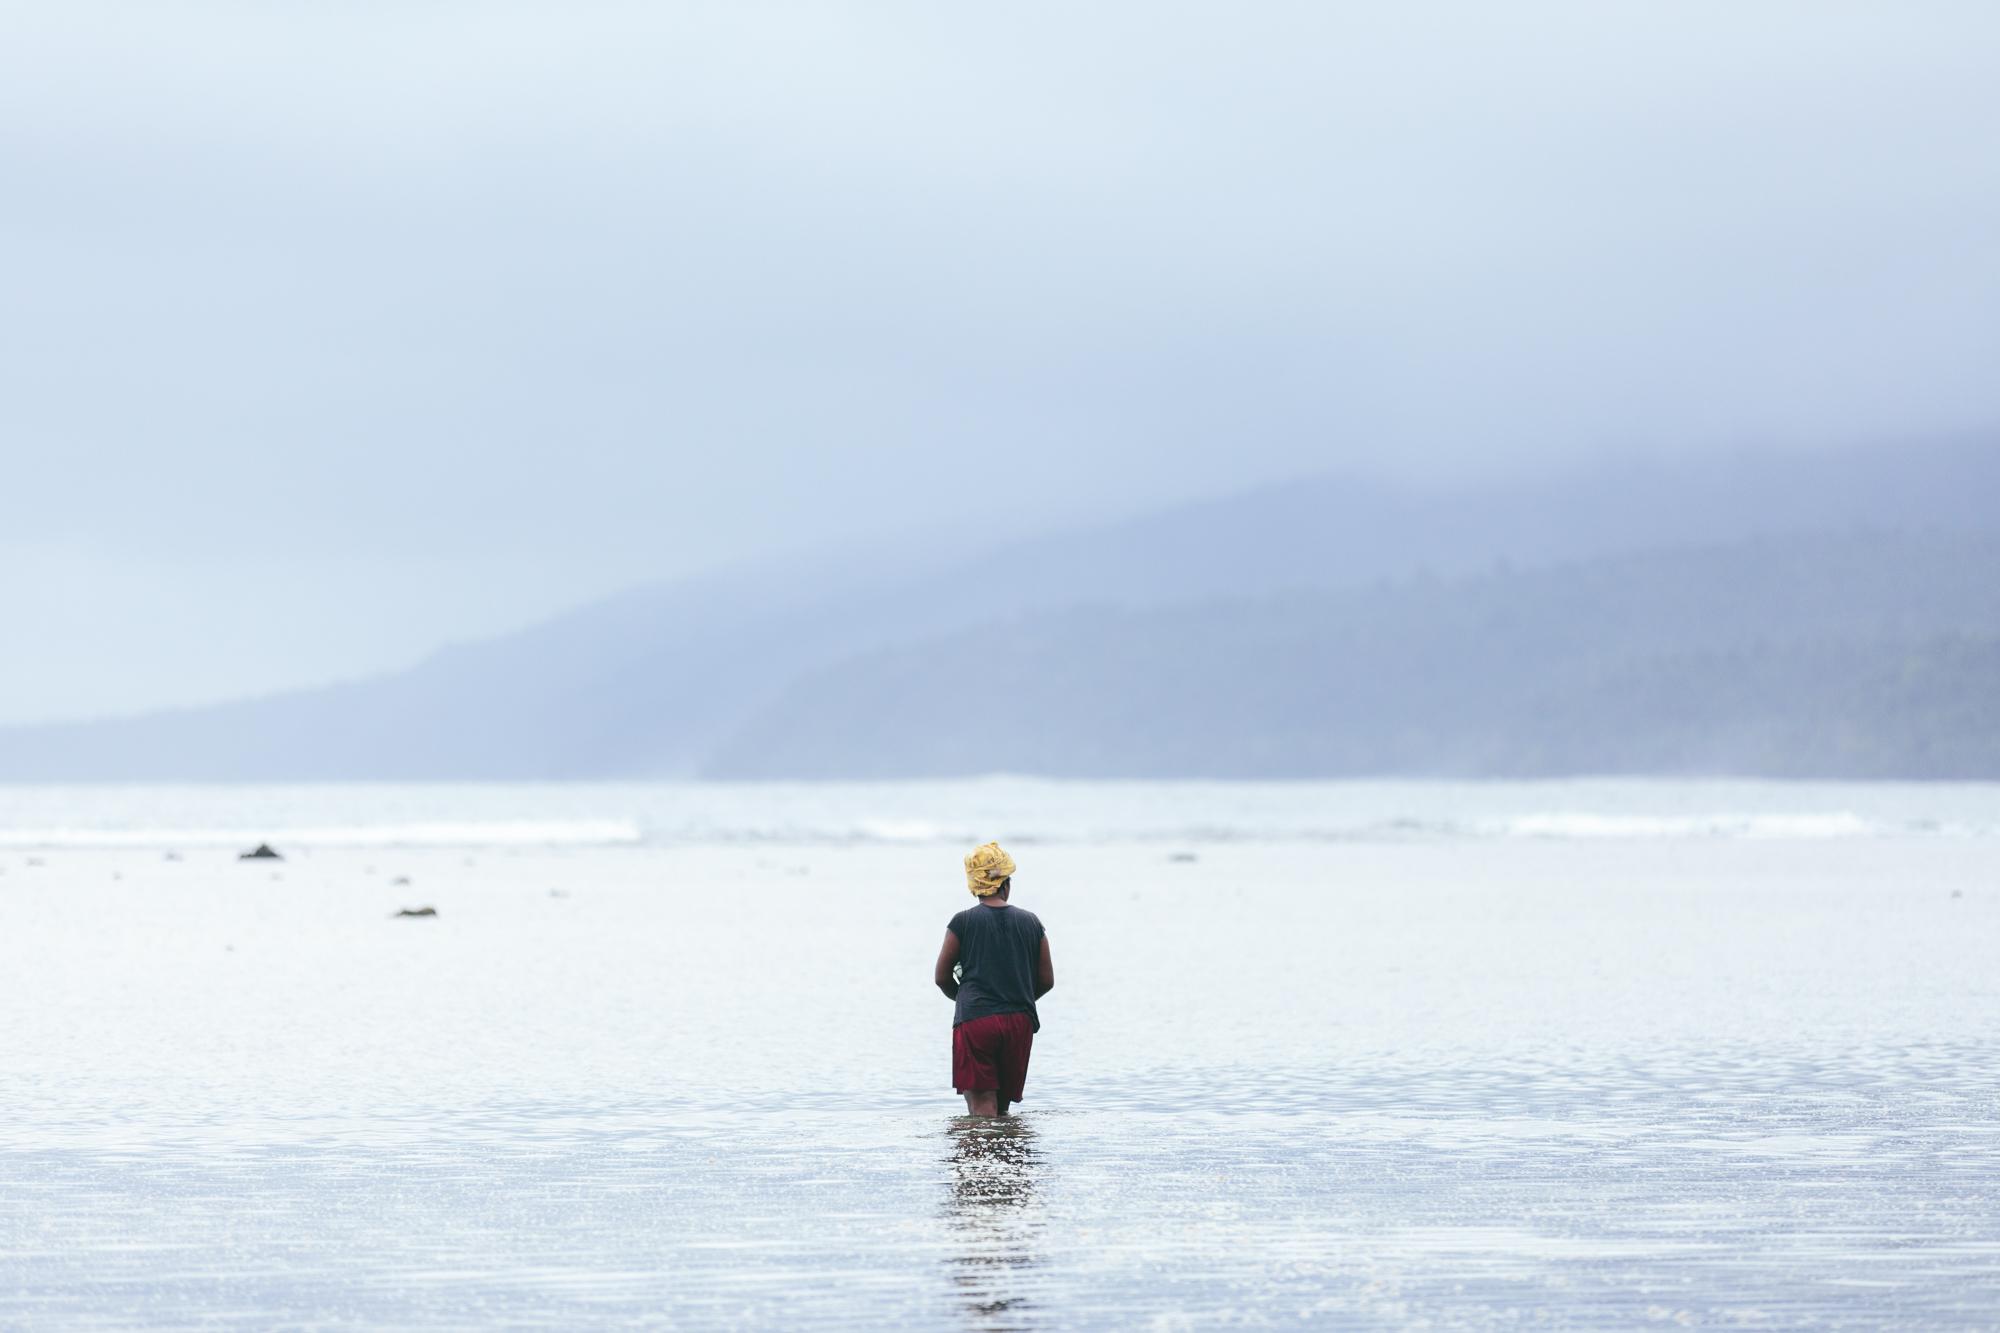 Fijian Lady Fishing- The Remote Resort Fiji Islands